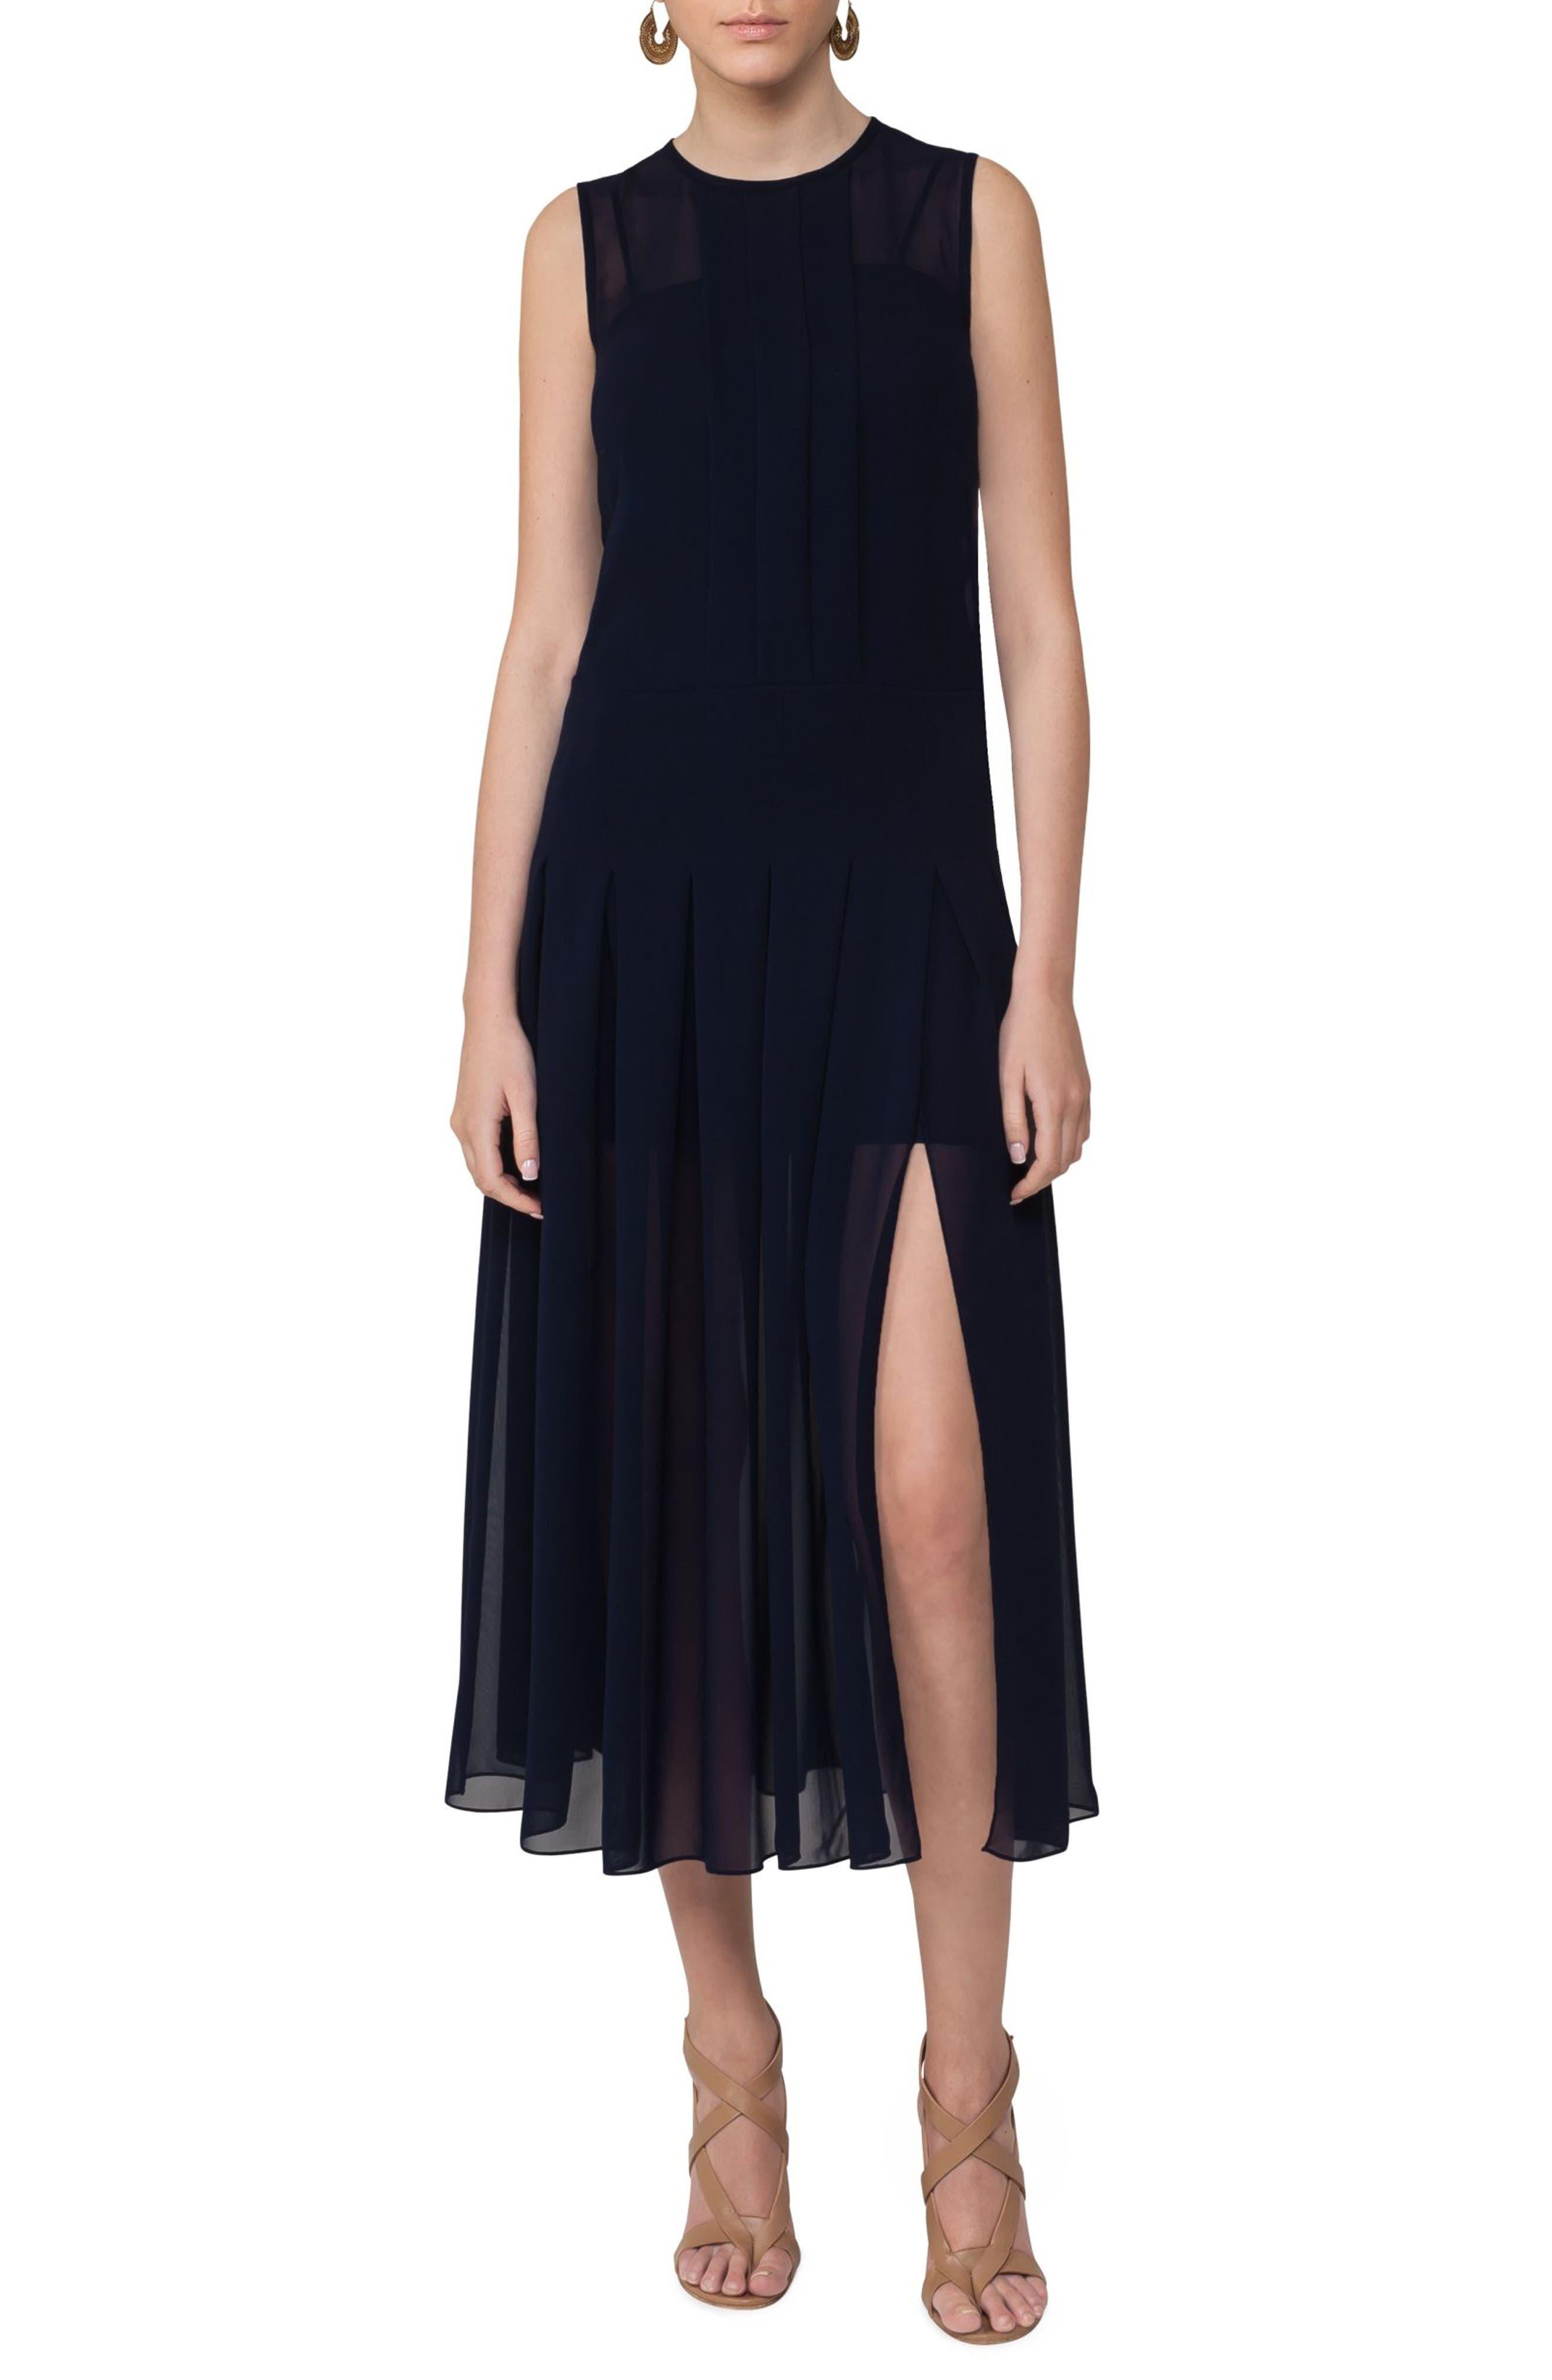 Alternate Image 1 Selected - Akris punto Sheer Pleat Midi Dress